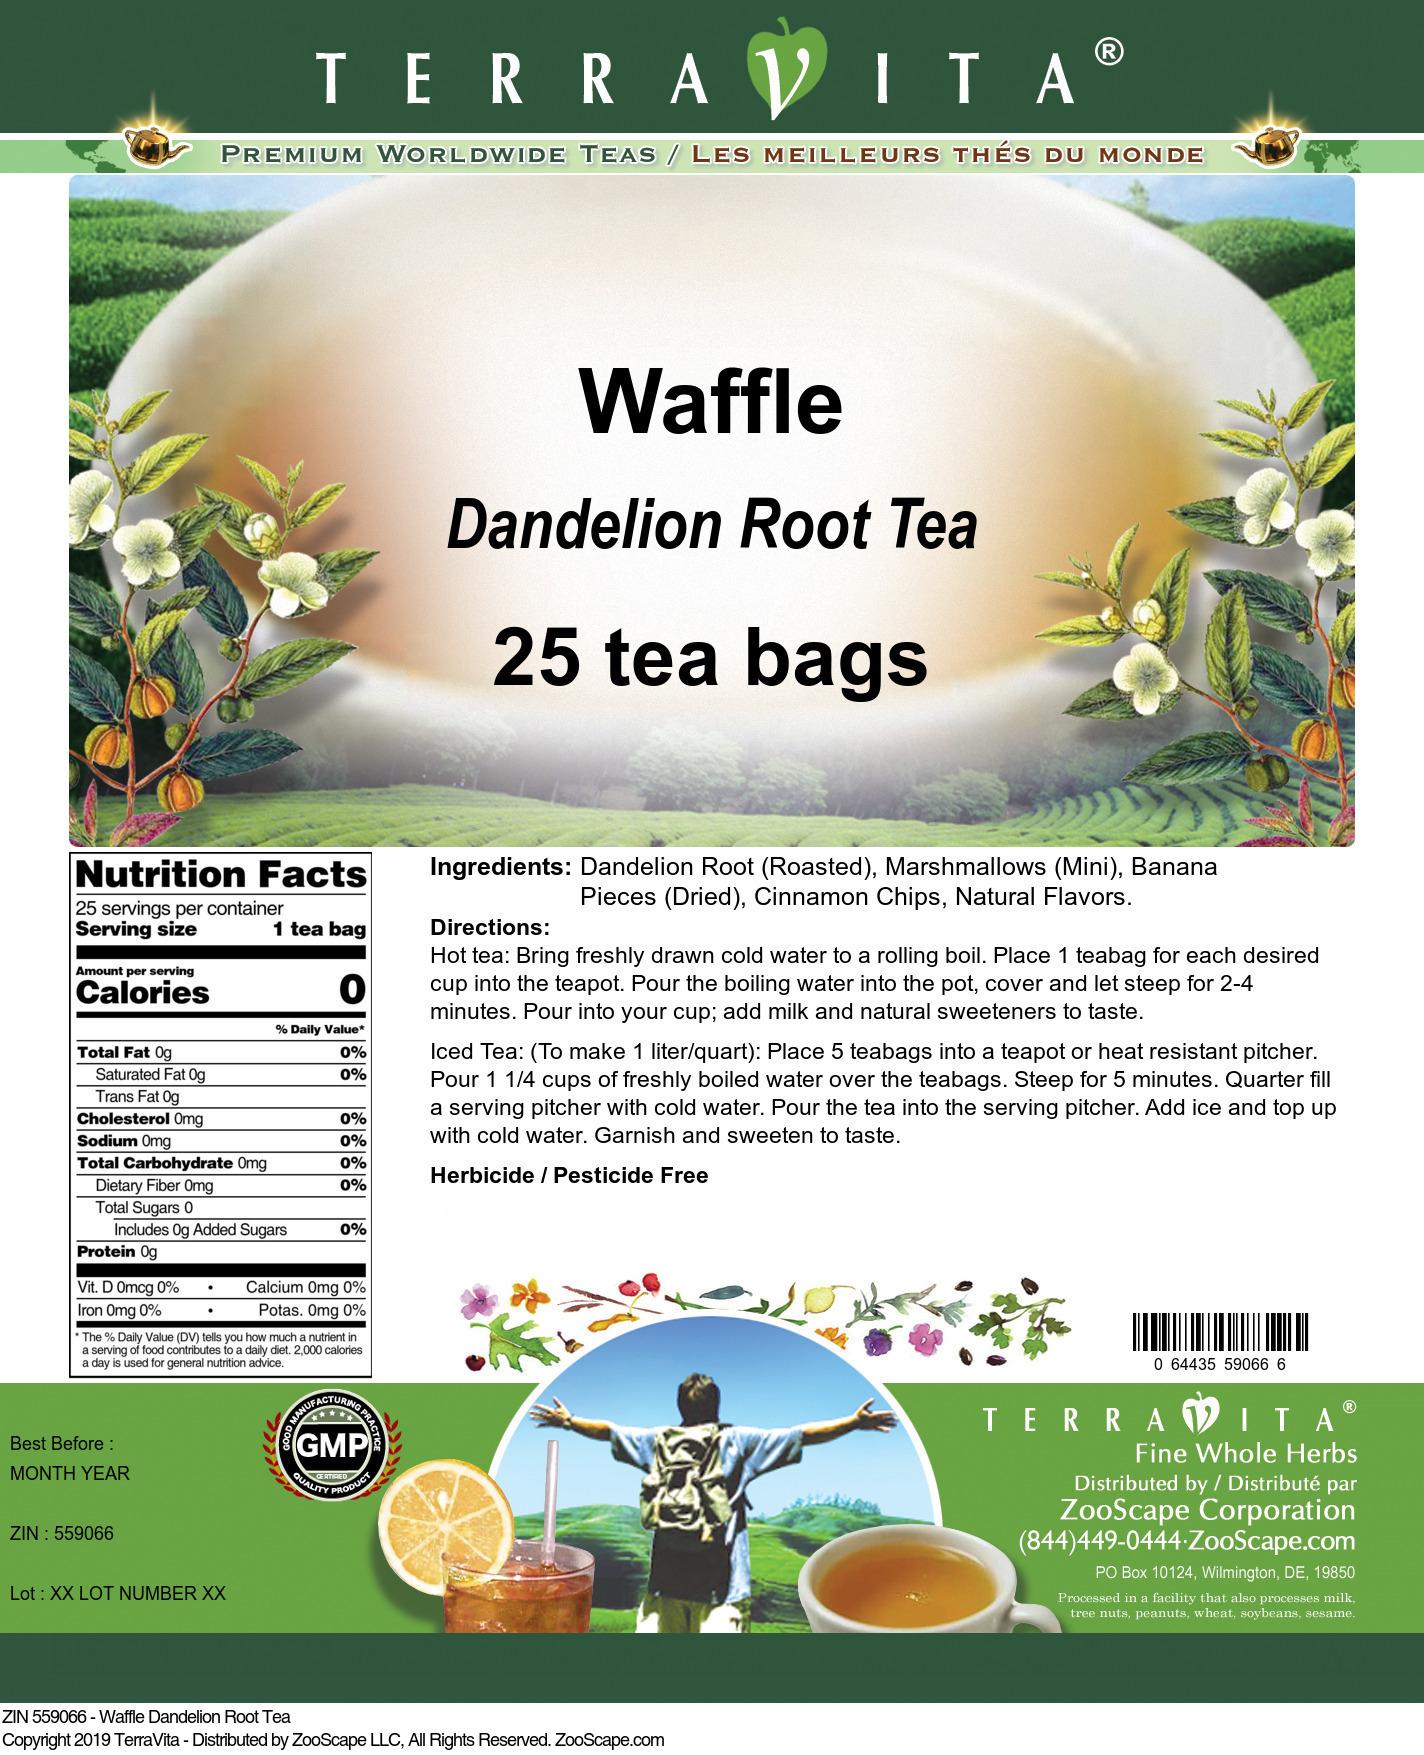 Waffle Dandelion Root Tea